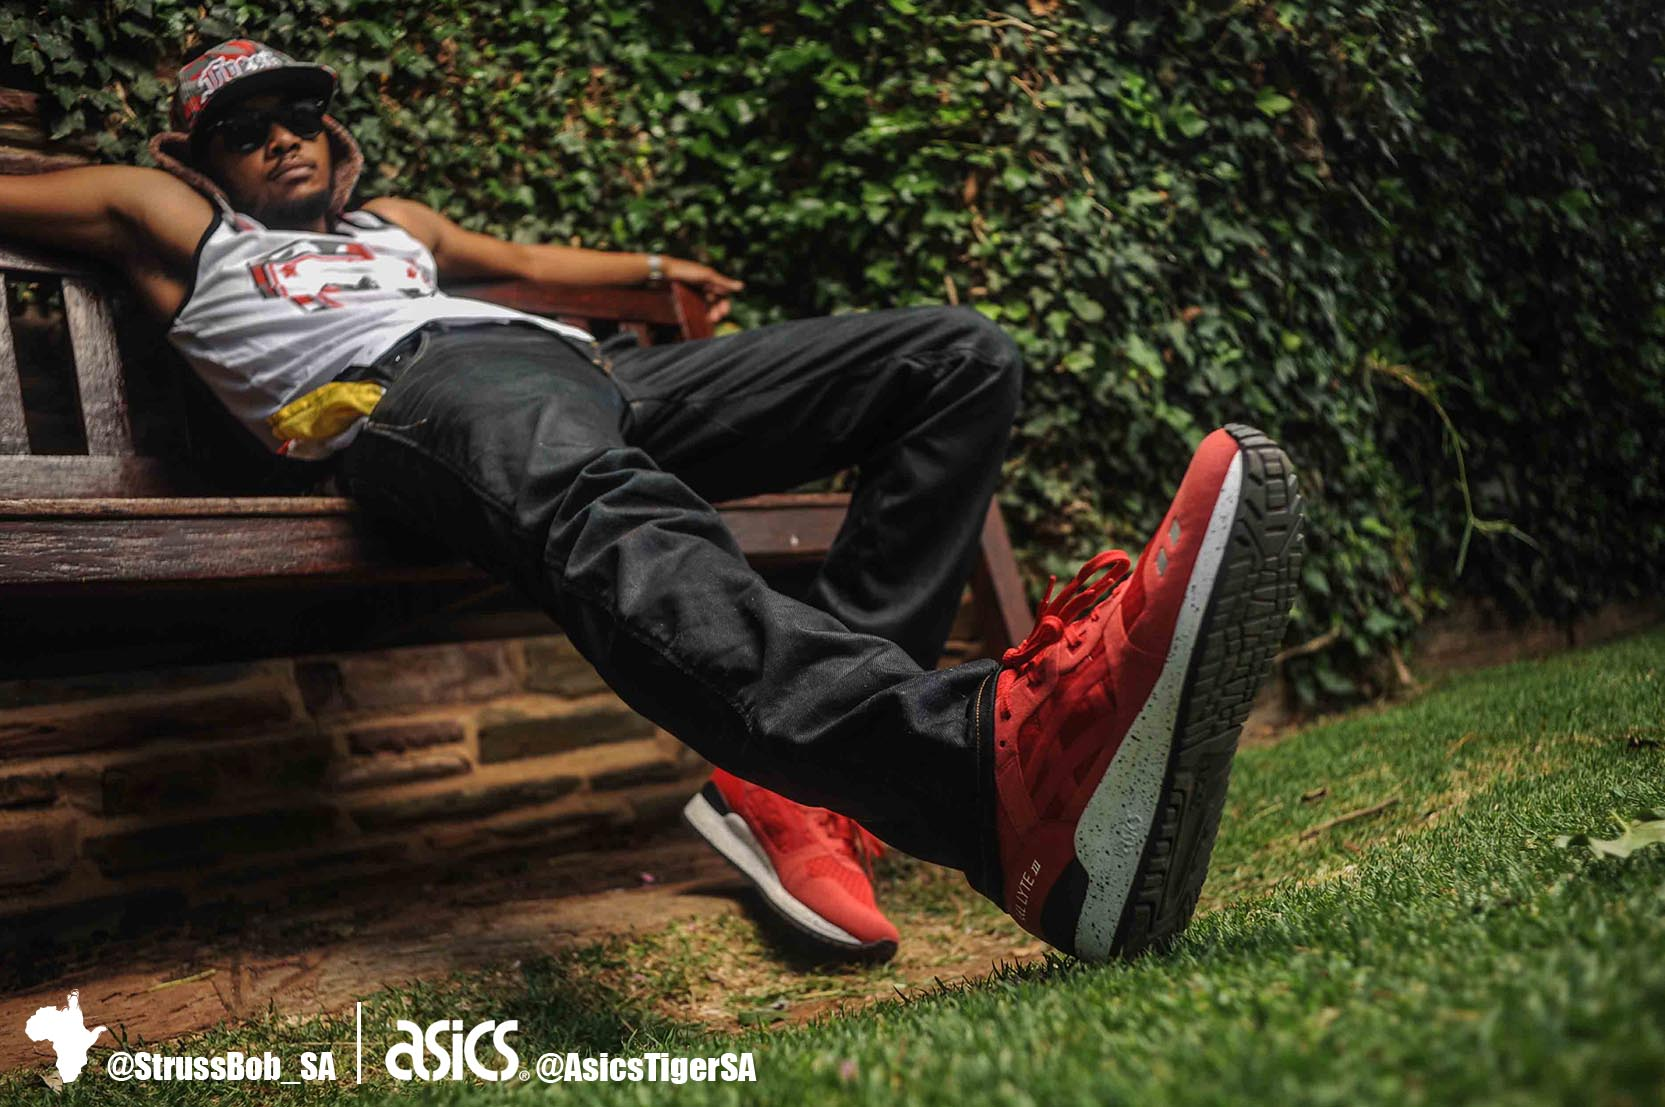 asics x strussbob shoot 12 black